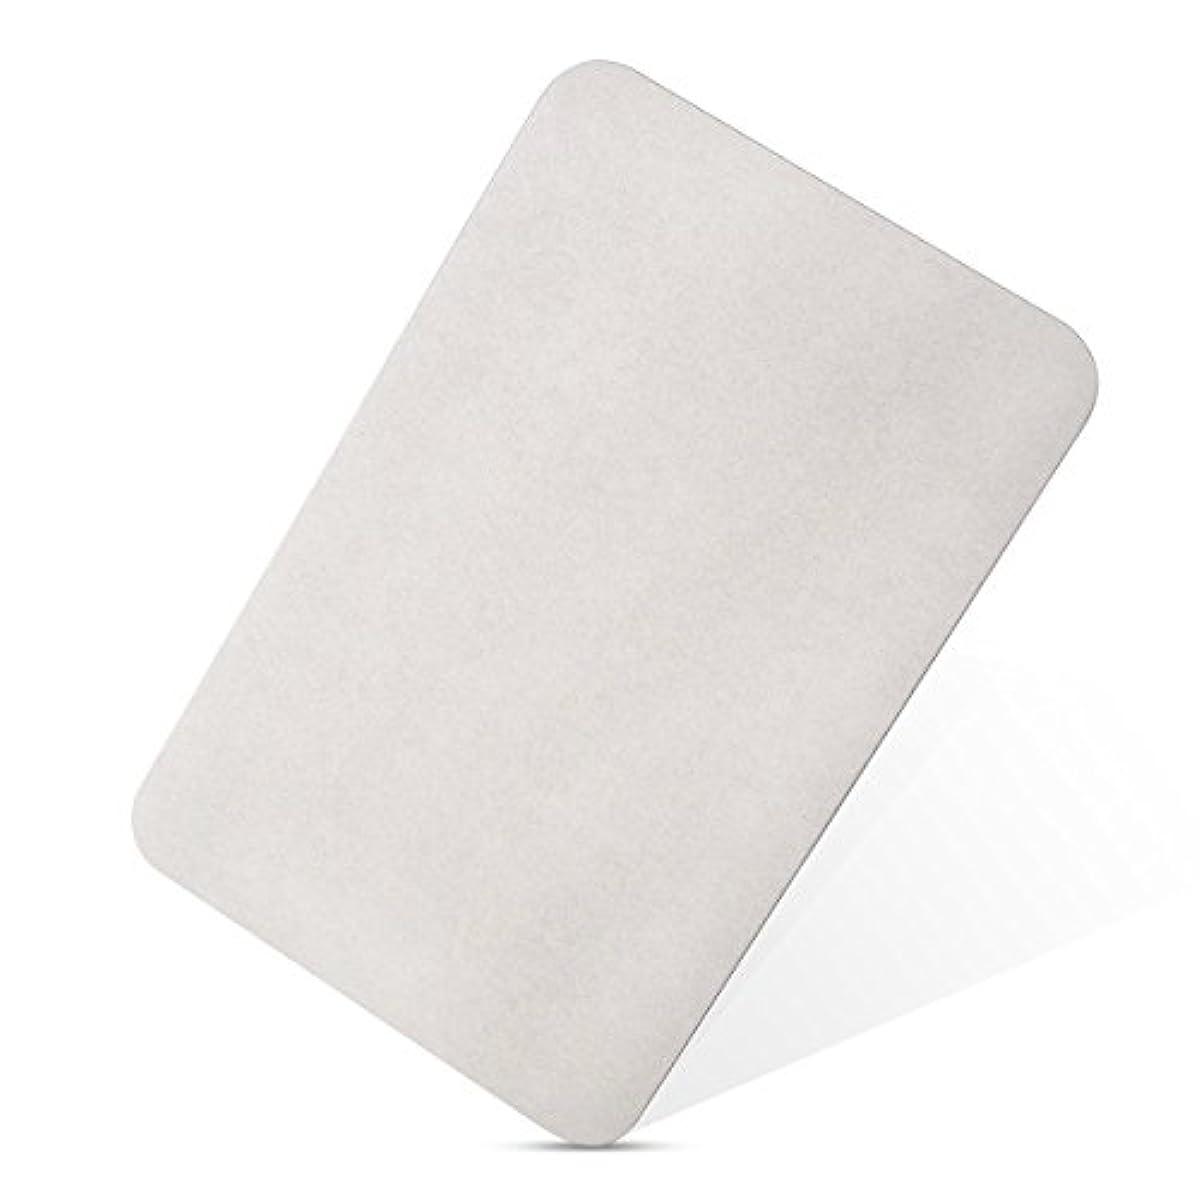 Tenswall 규조토 버스 매트 목욕탕 매트 발 닦아 매트 소취속 건방곰팡이 방다《니》 항균 약60cm×39cm JD001 (Color:핑크)